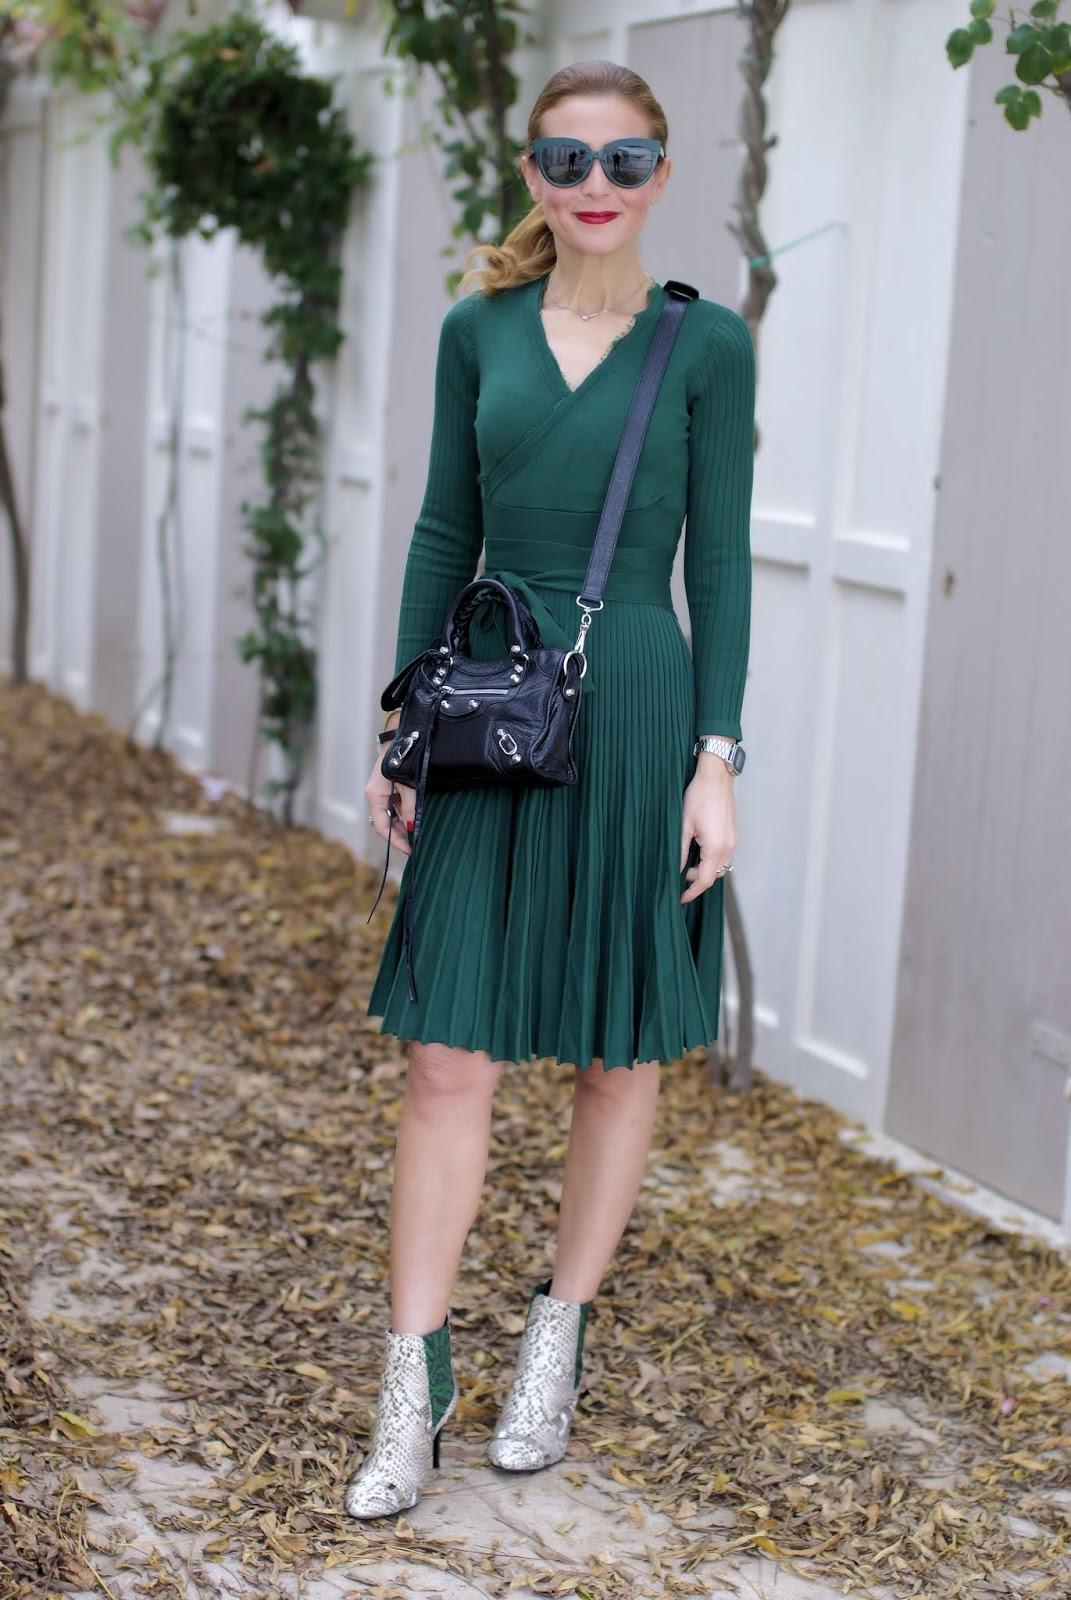 Metisu wrap neckline dress on Fashion and Cookies fashion blog, fashion blogger style